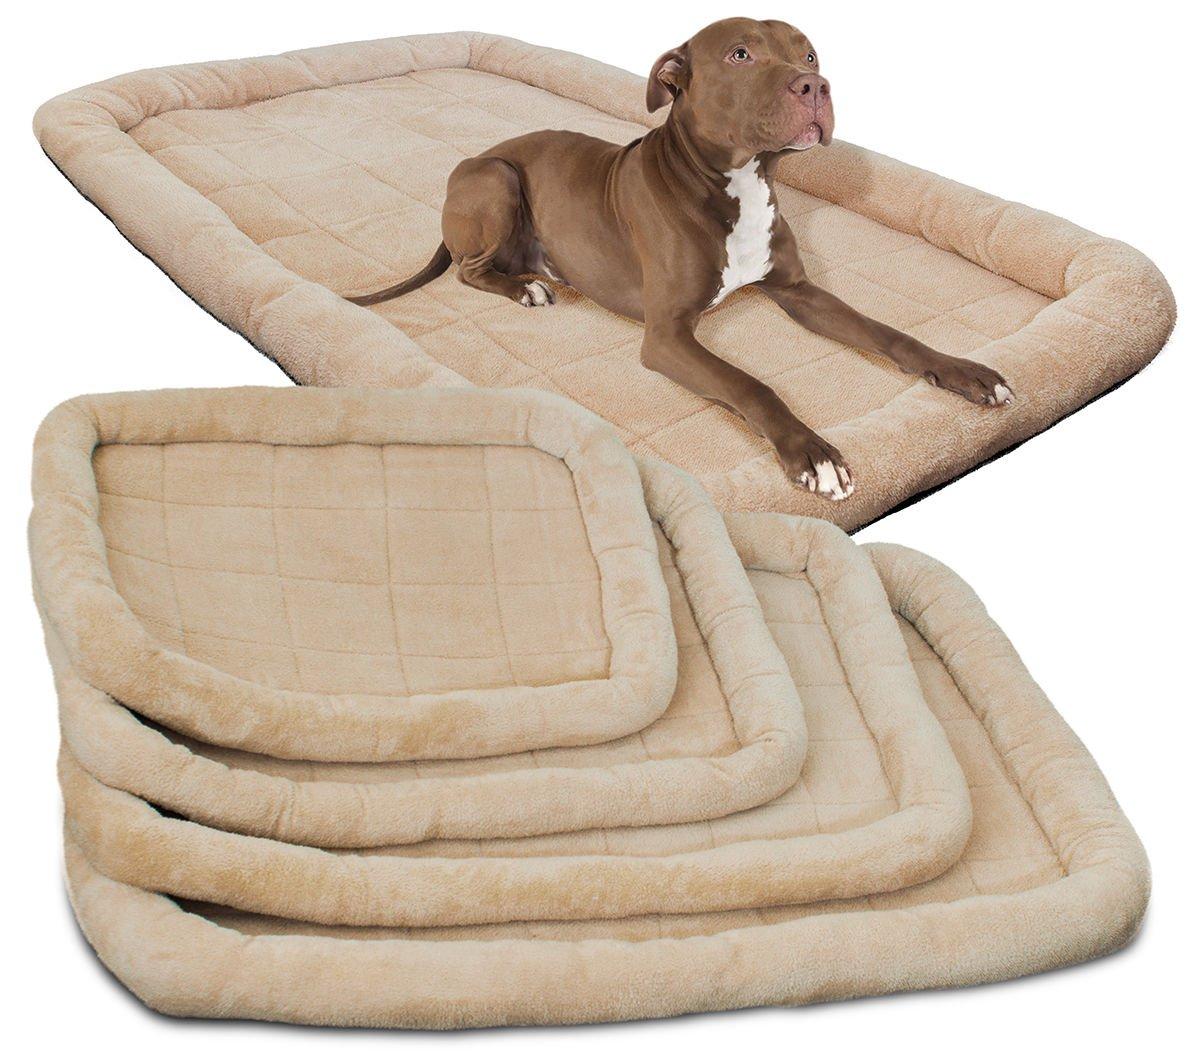 S AFSTAR Safstar Soft Pet Cushion Mat Dog Cat Bedding Mattress Pad (XXL)